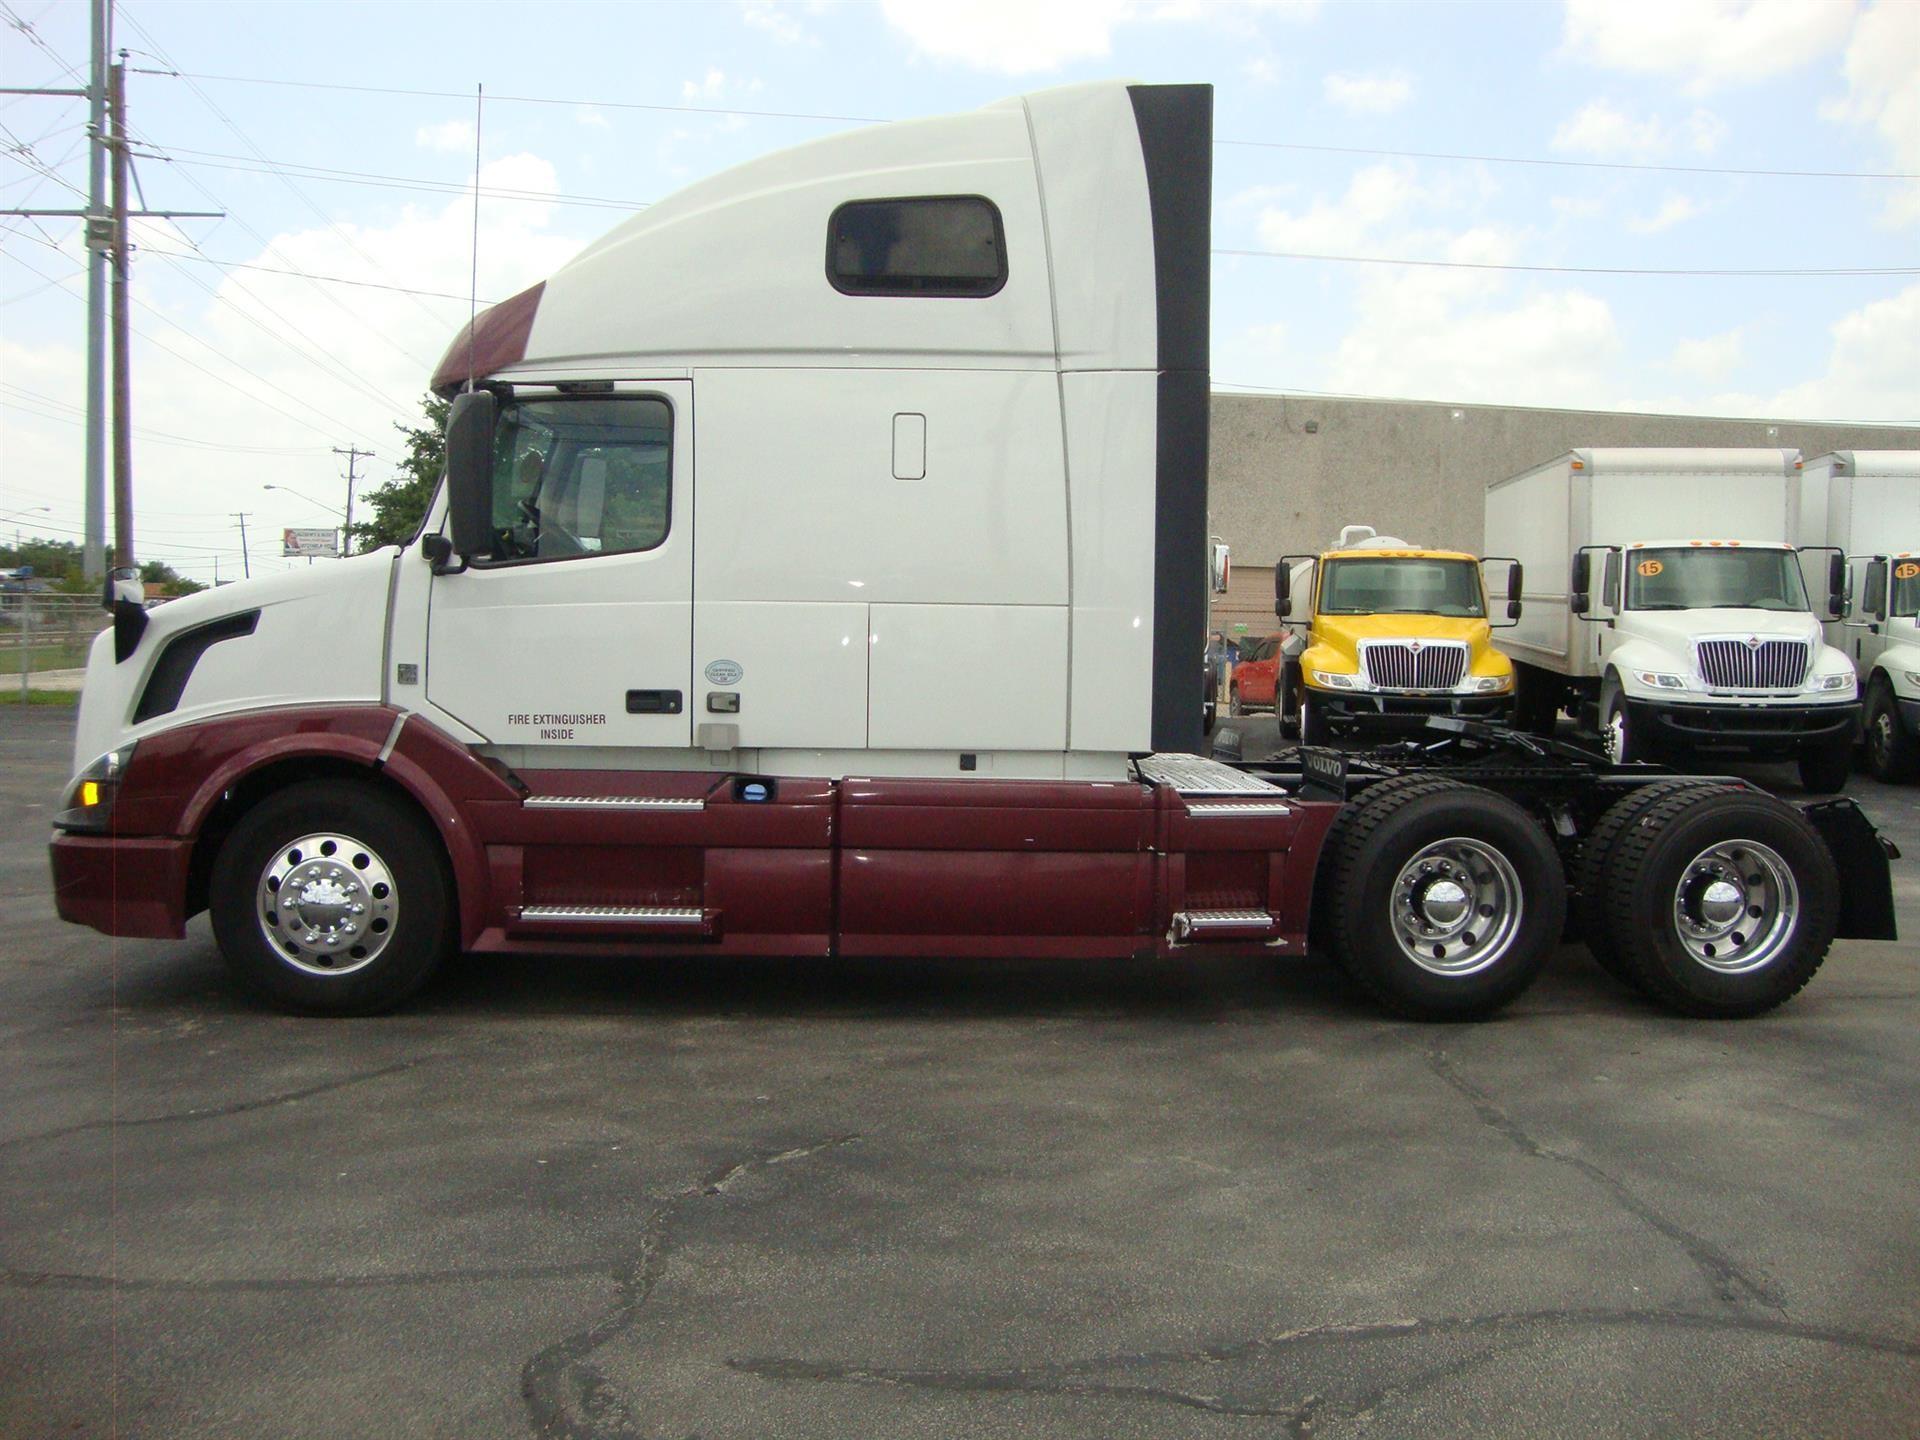 Full Service Commercial Truck Dealer In Waco, Texas